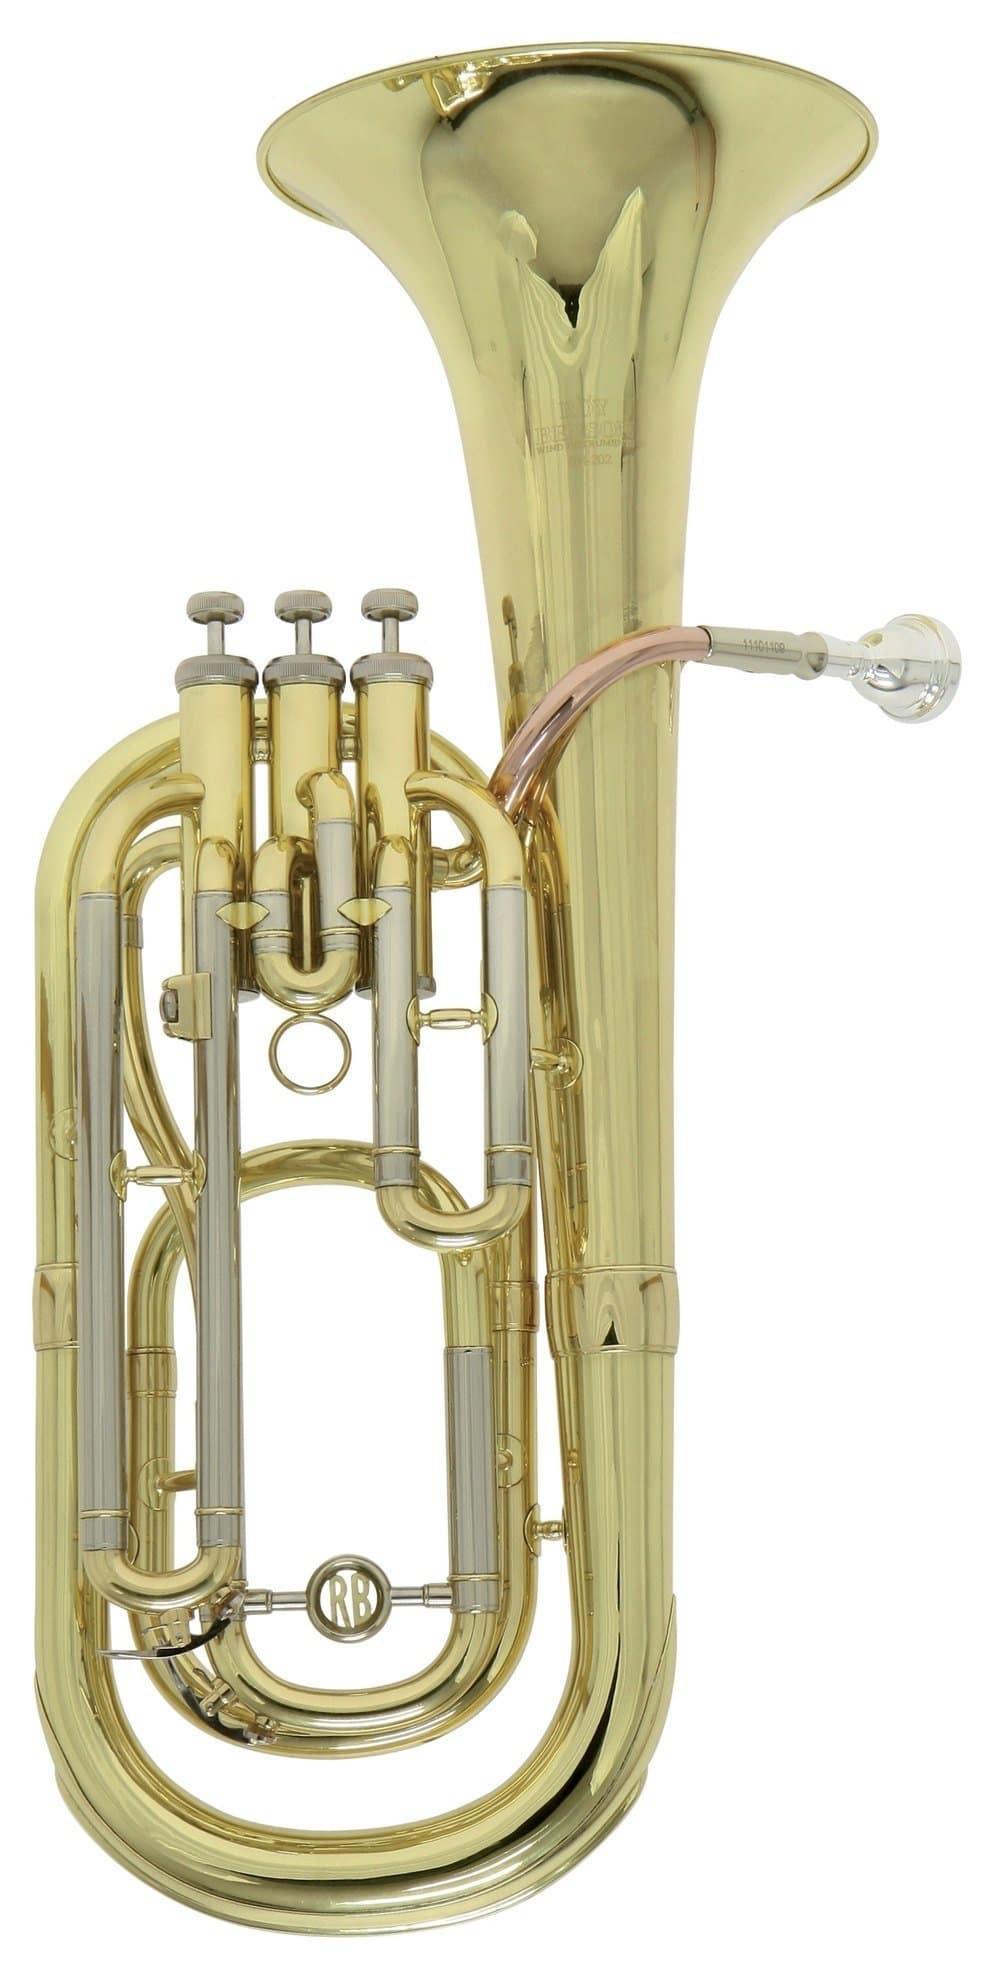 Baritone - Roy Benson BH 301 B Bariton - Onlineshop Musikhaus Kirstein